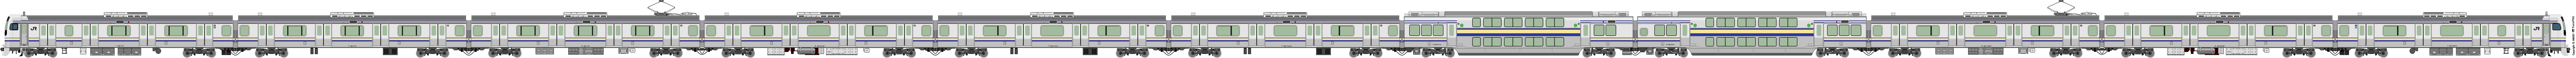 Train 5015